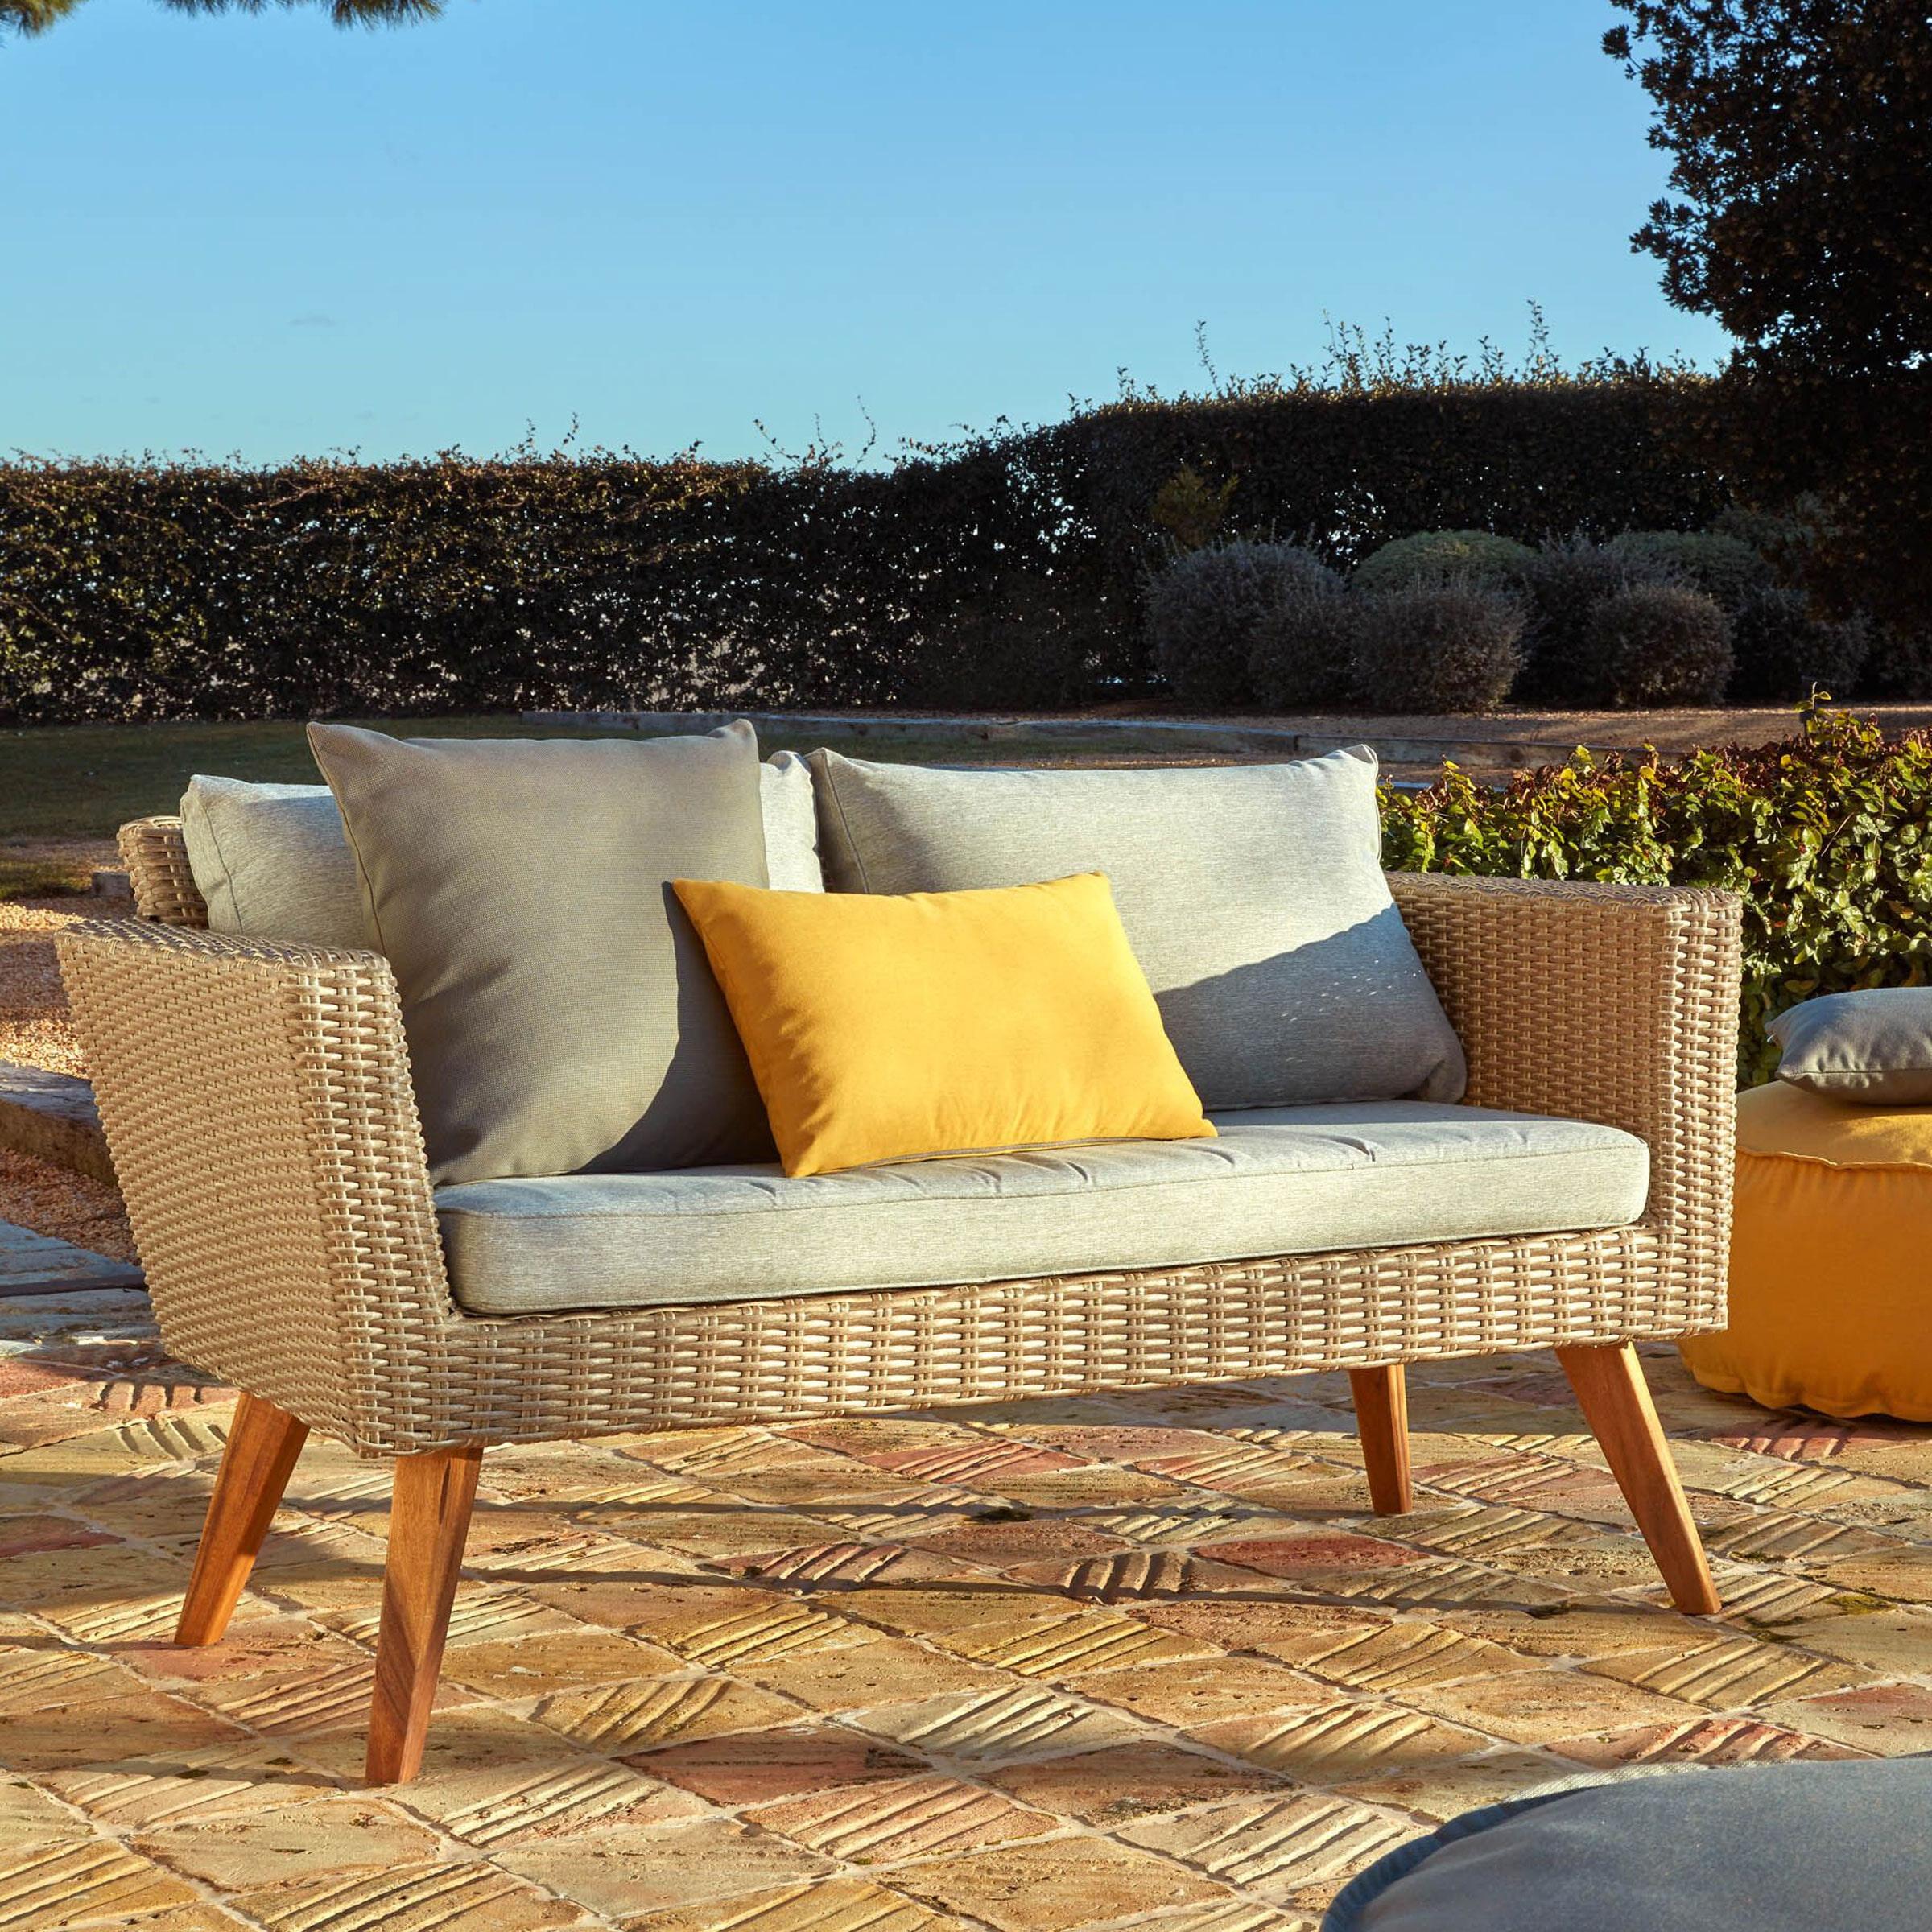 Kave Home Tuinbank 'Sumie' kleur Naturel